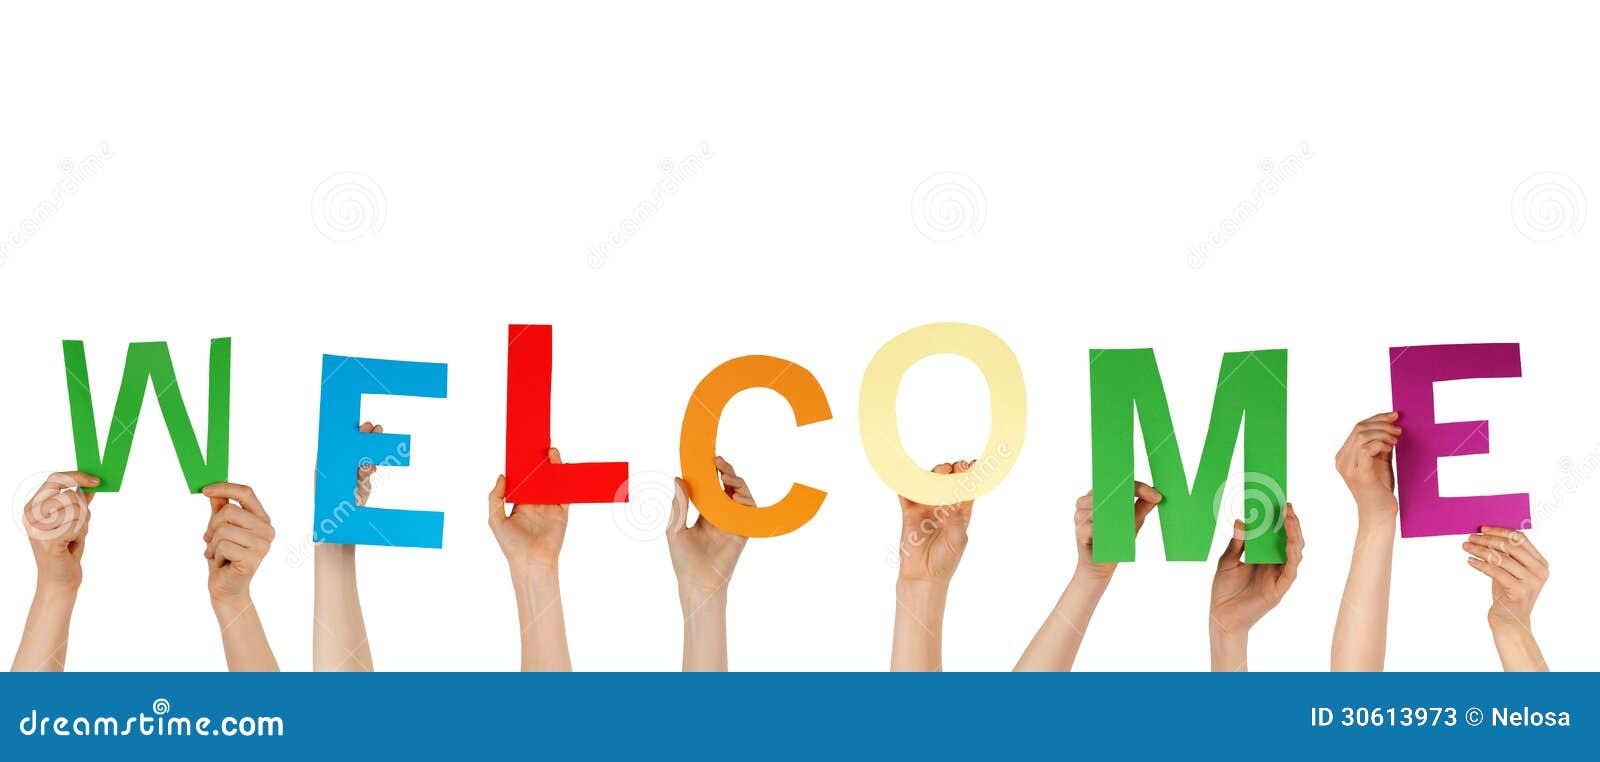 Welcome hands png